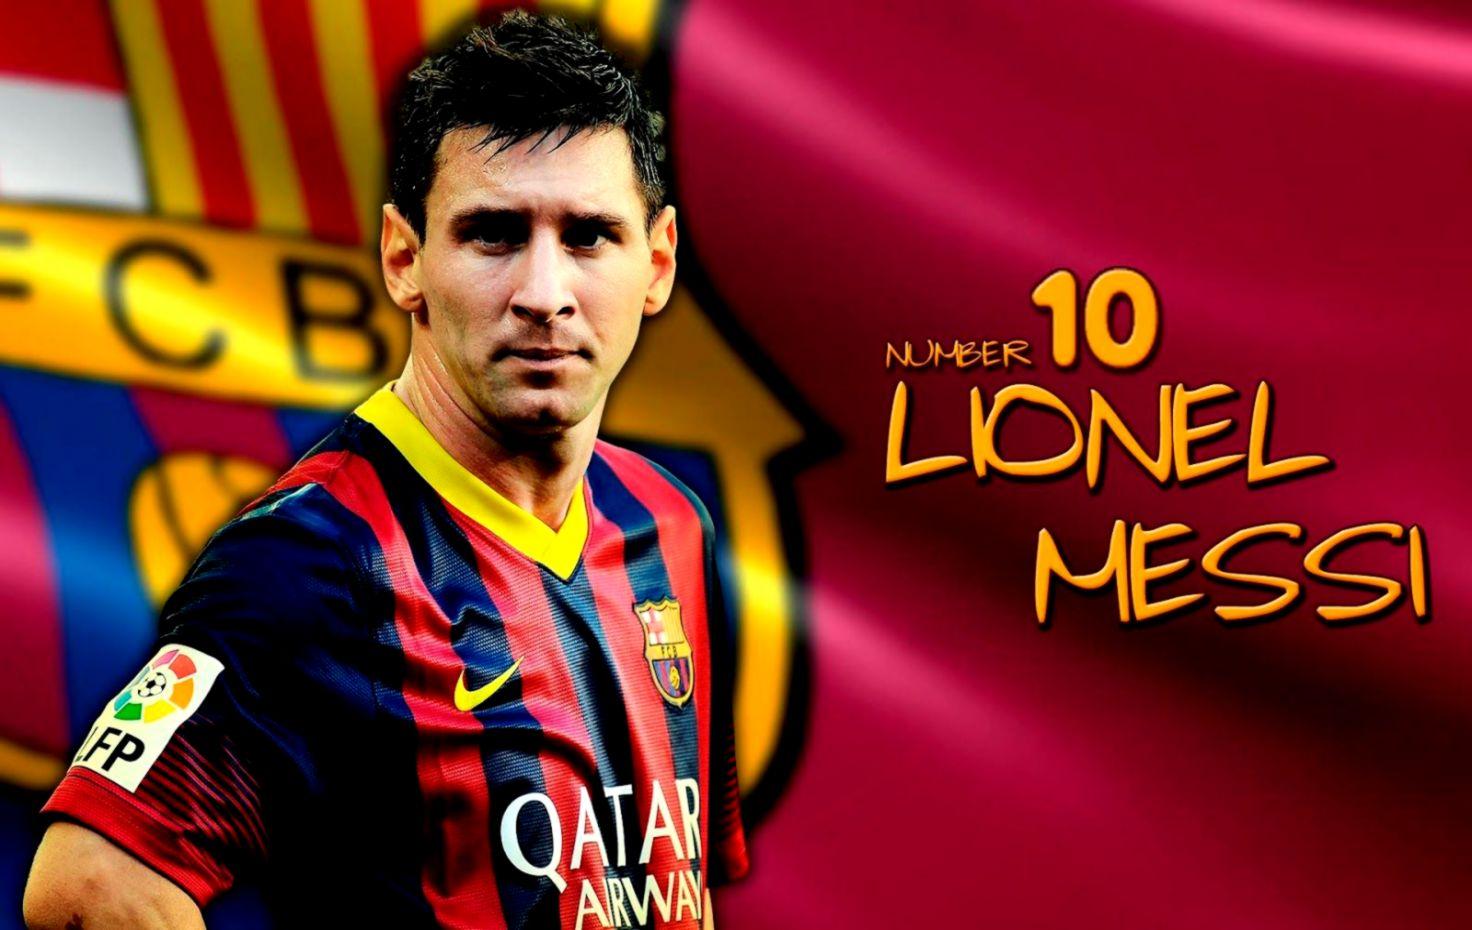 Barcelona Messi 2014 Hd Wallpaper Wallpapers User